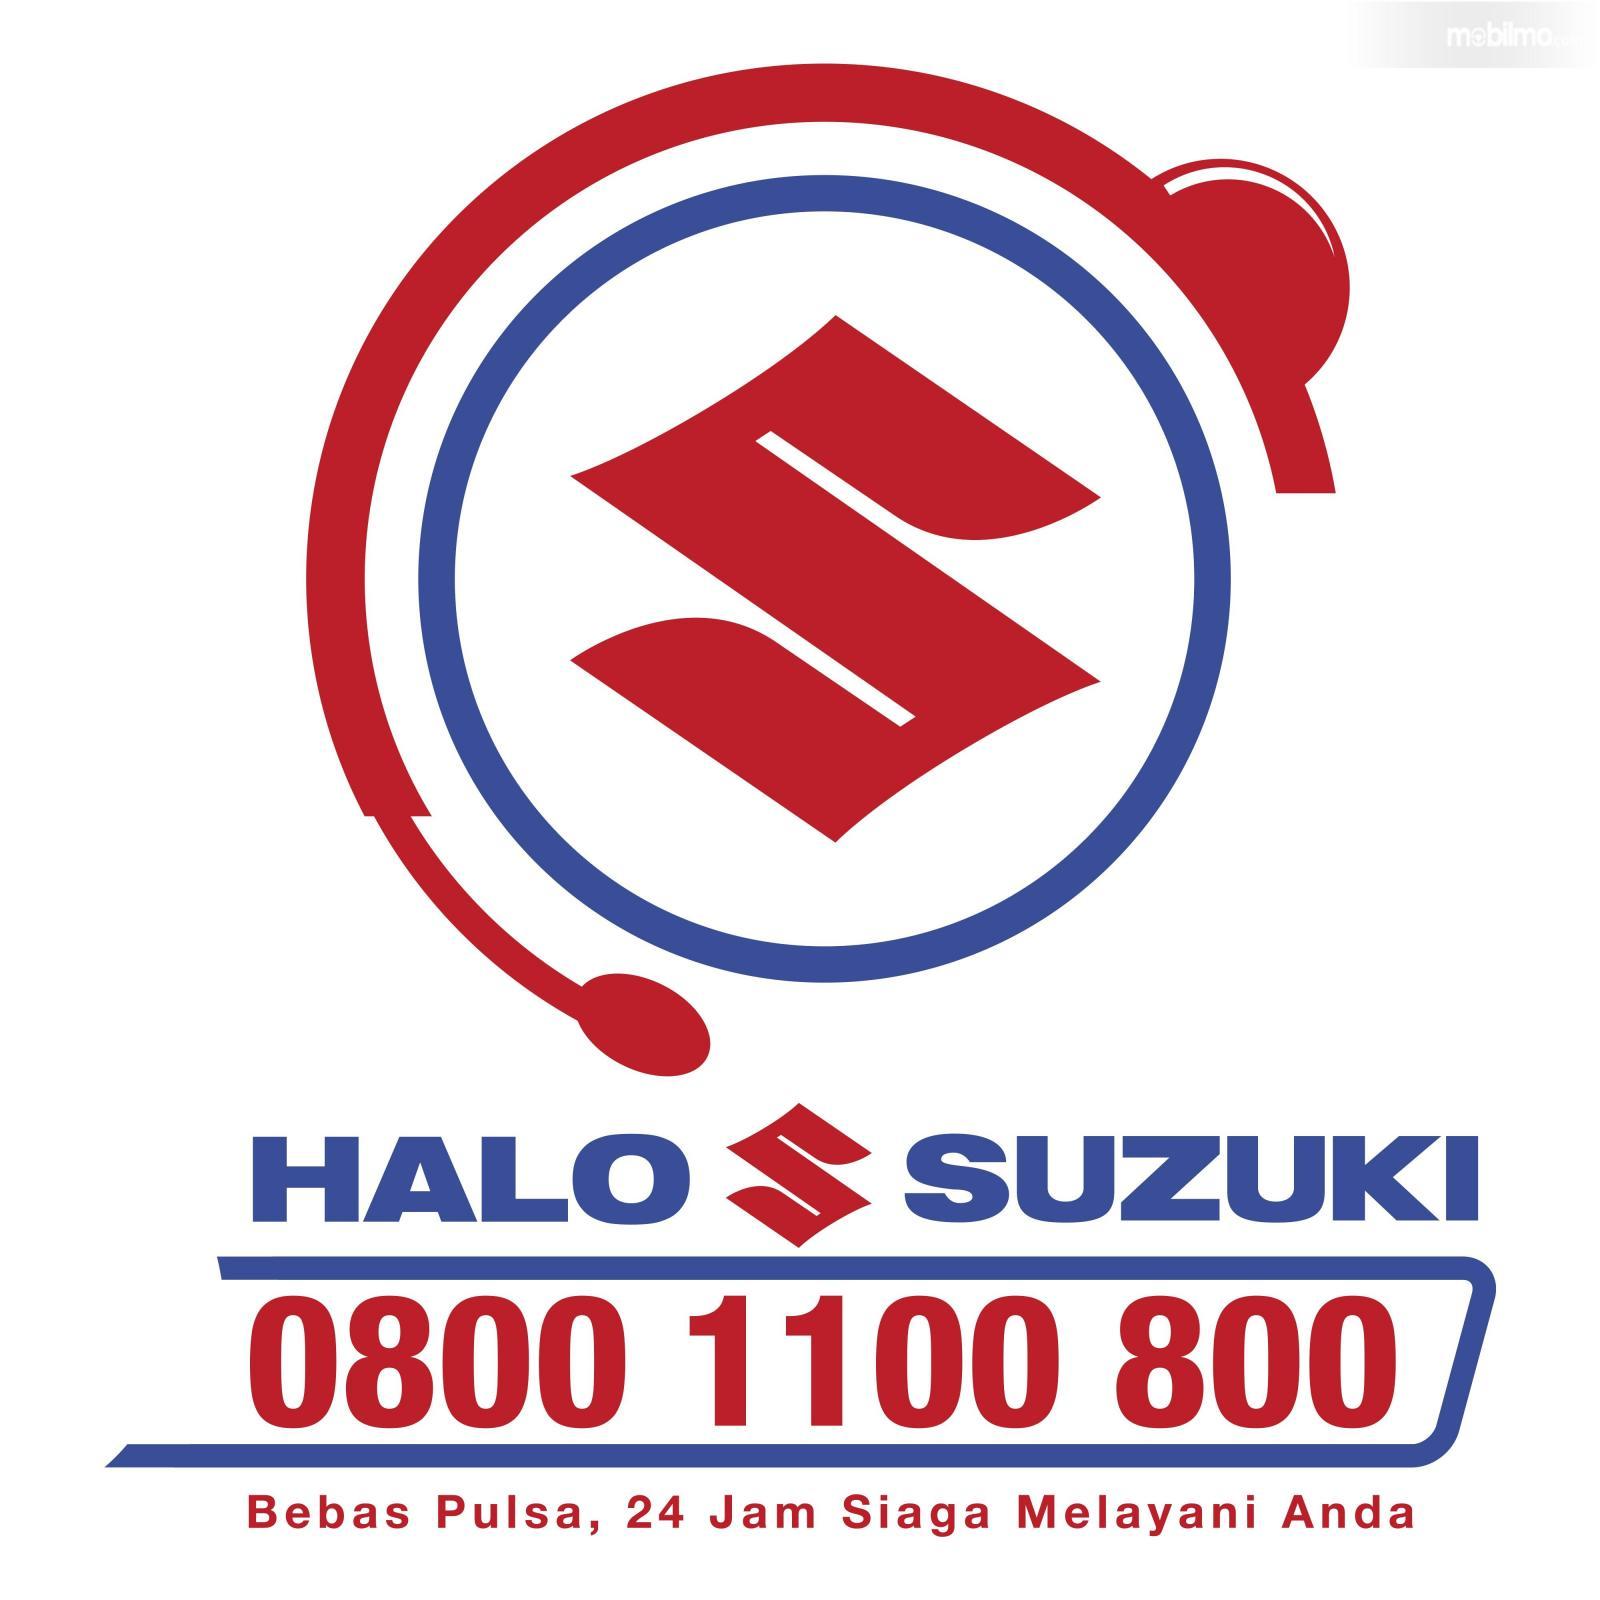 Gambar logo Hallo Suzuki yang baru